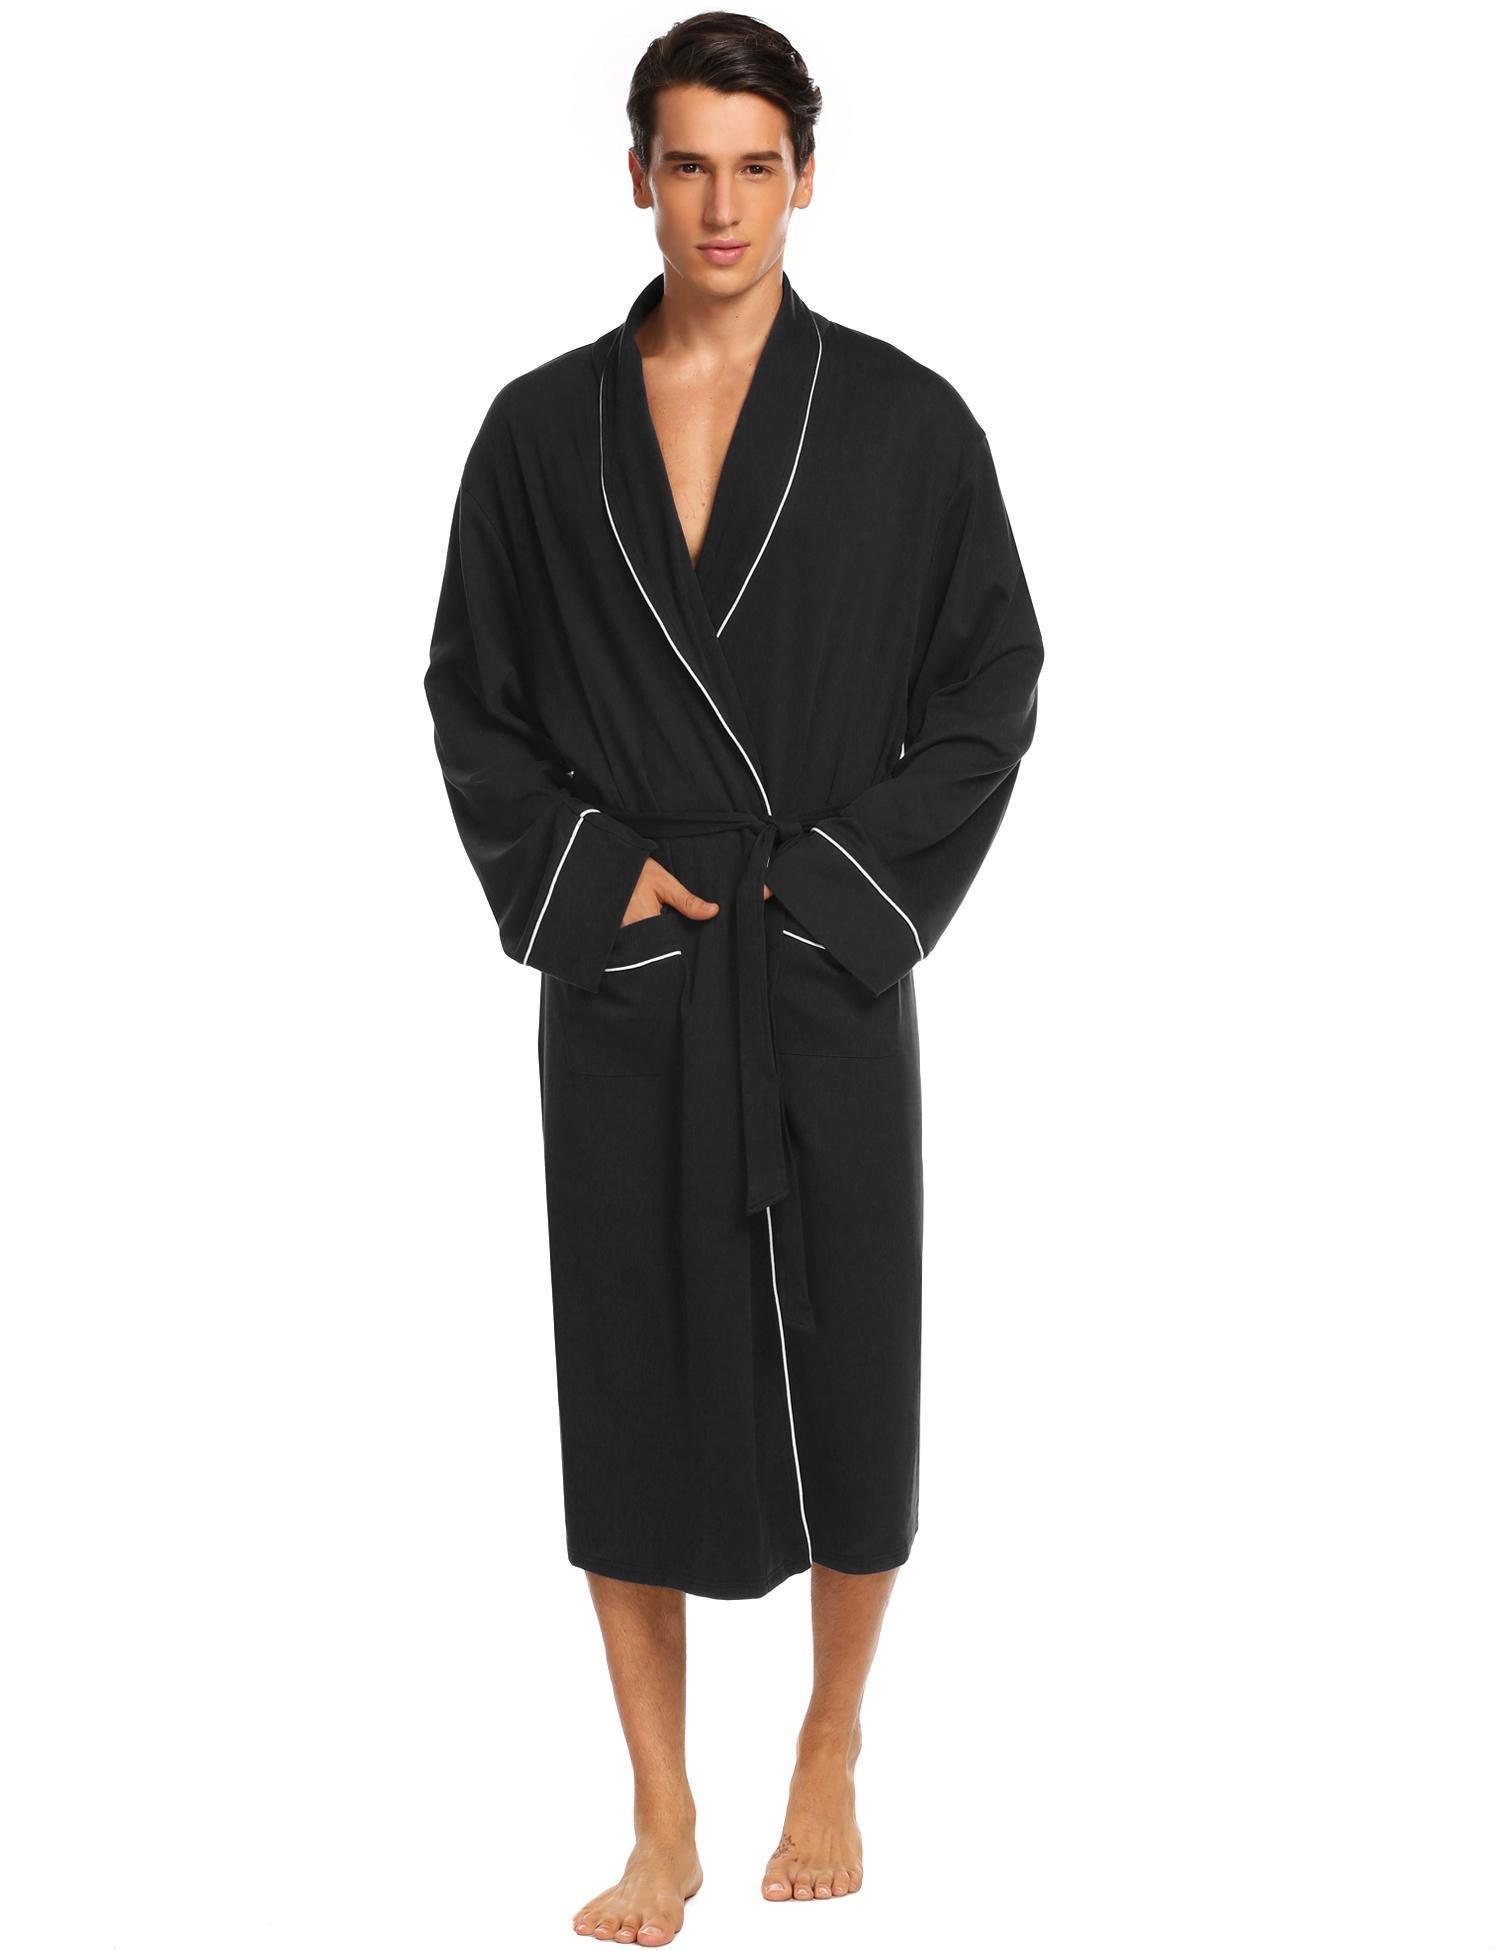 Donet Bathrobe Mens Cotton Spa Robes Lightweight Bath Robe Lounge Sleepwear